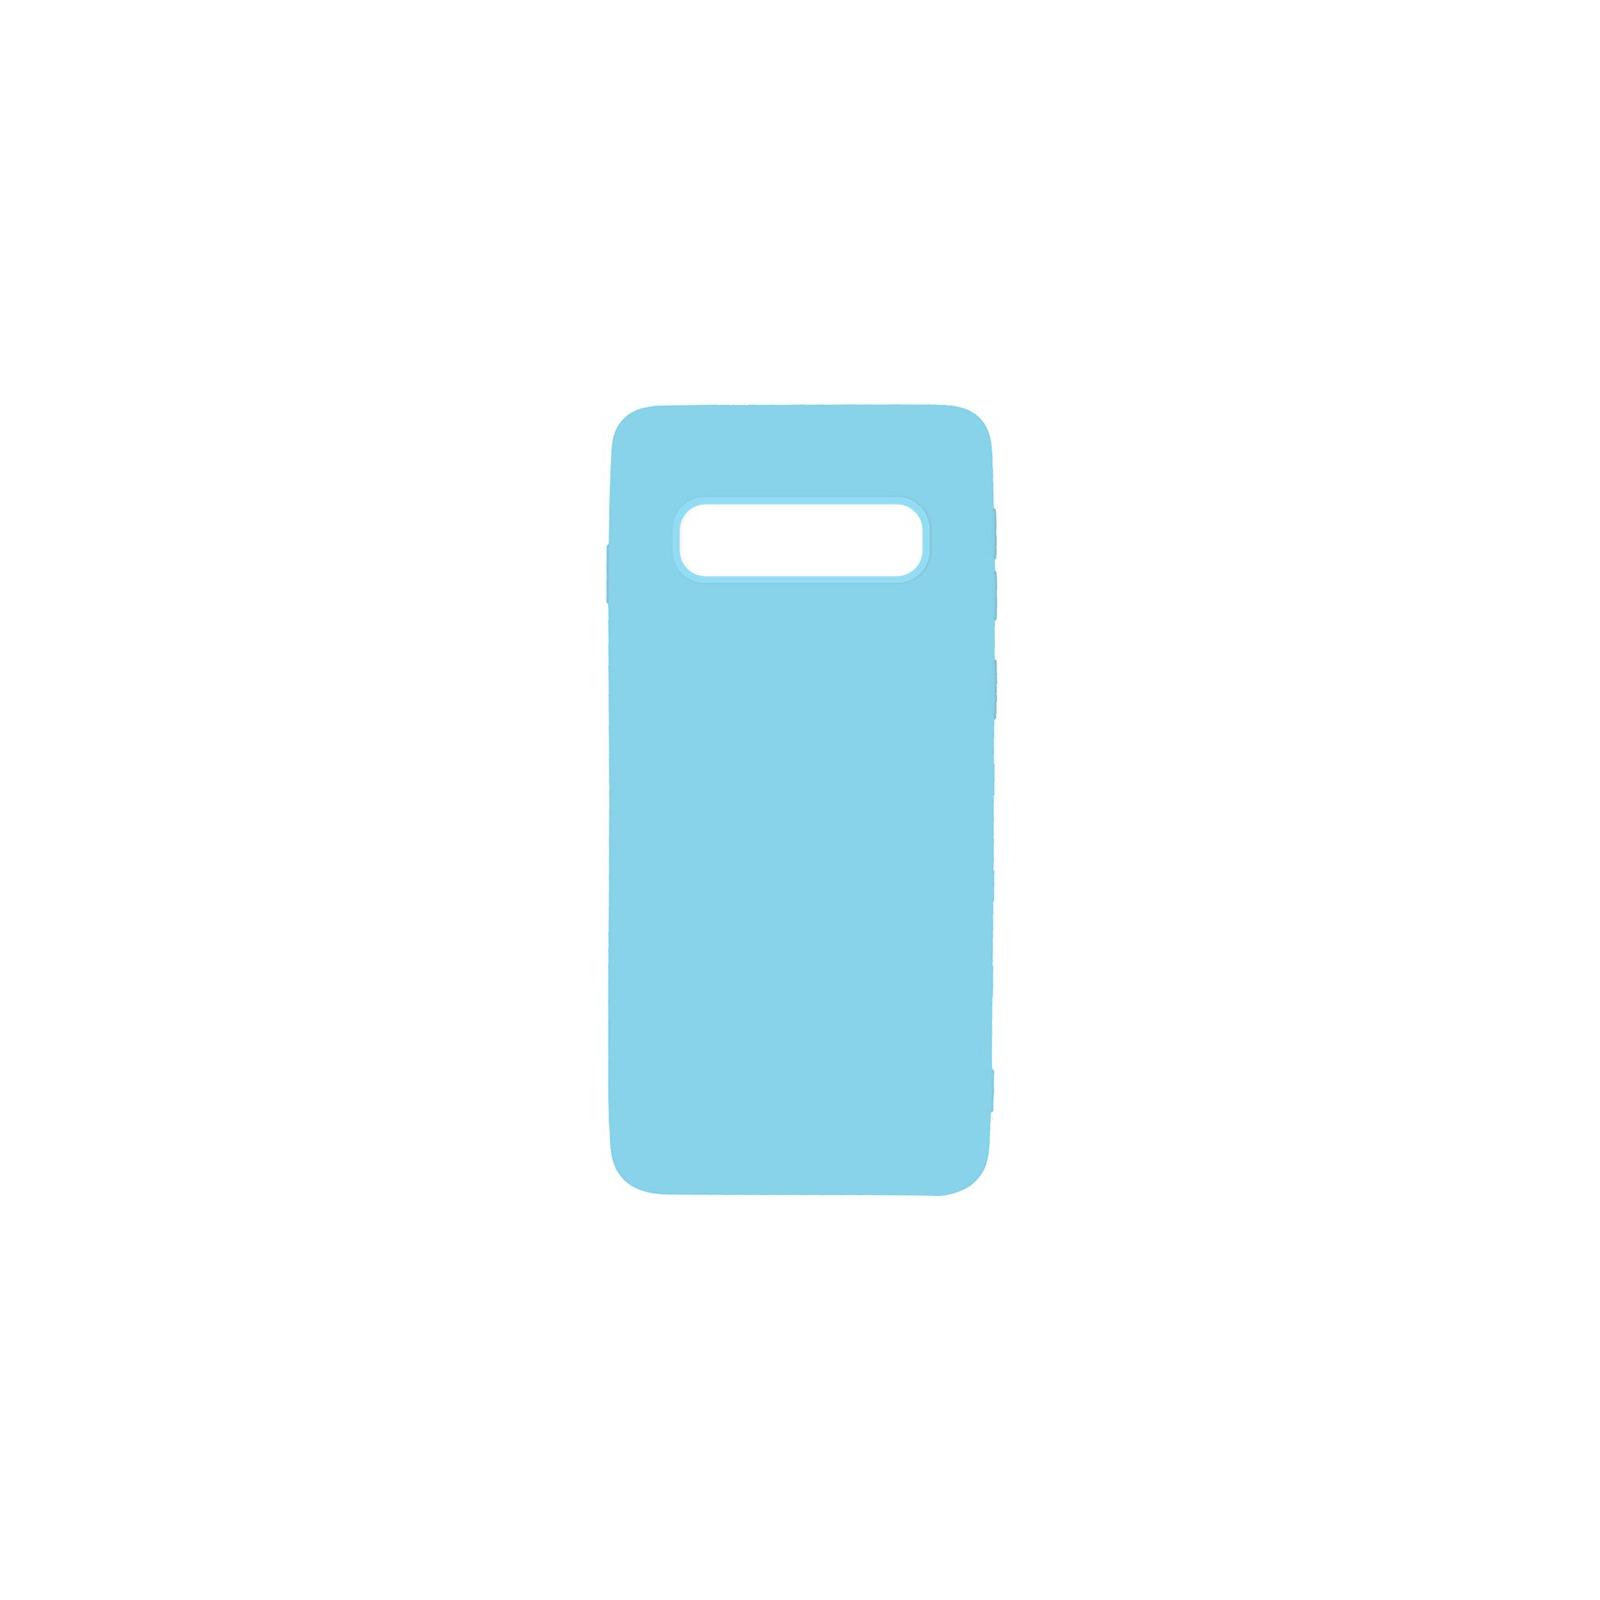 Чехол для моб. телефона Toto 1mm Matt TPU Case Samsung Galaxy S10+ Ocean Blue (F_94082)